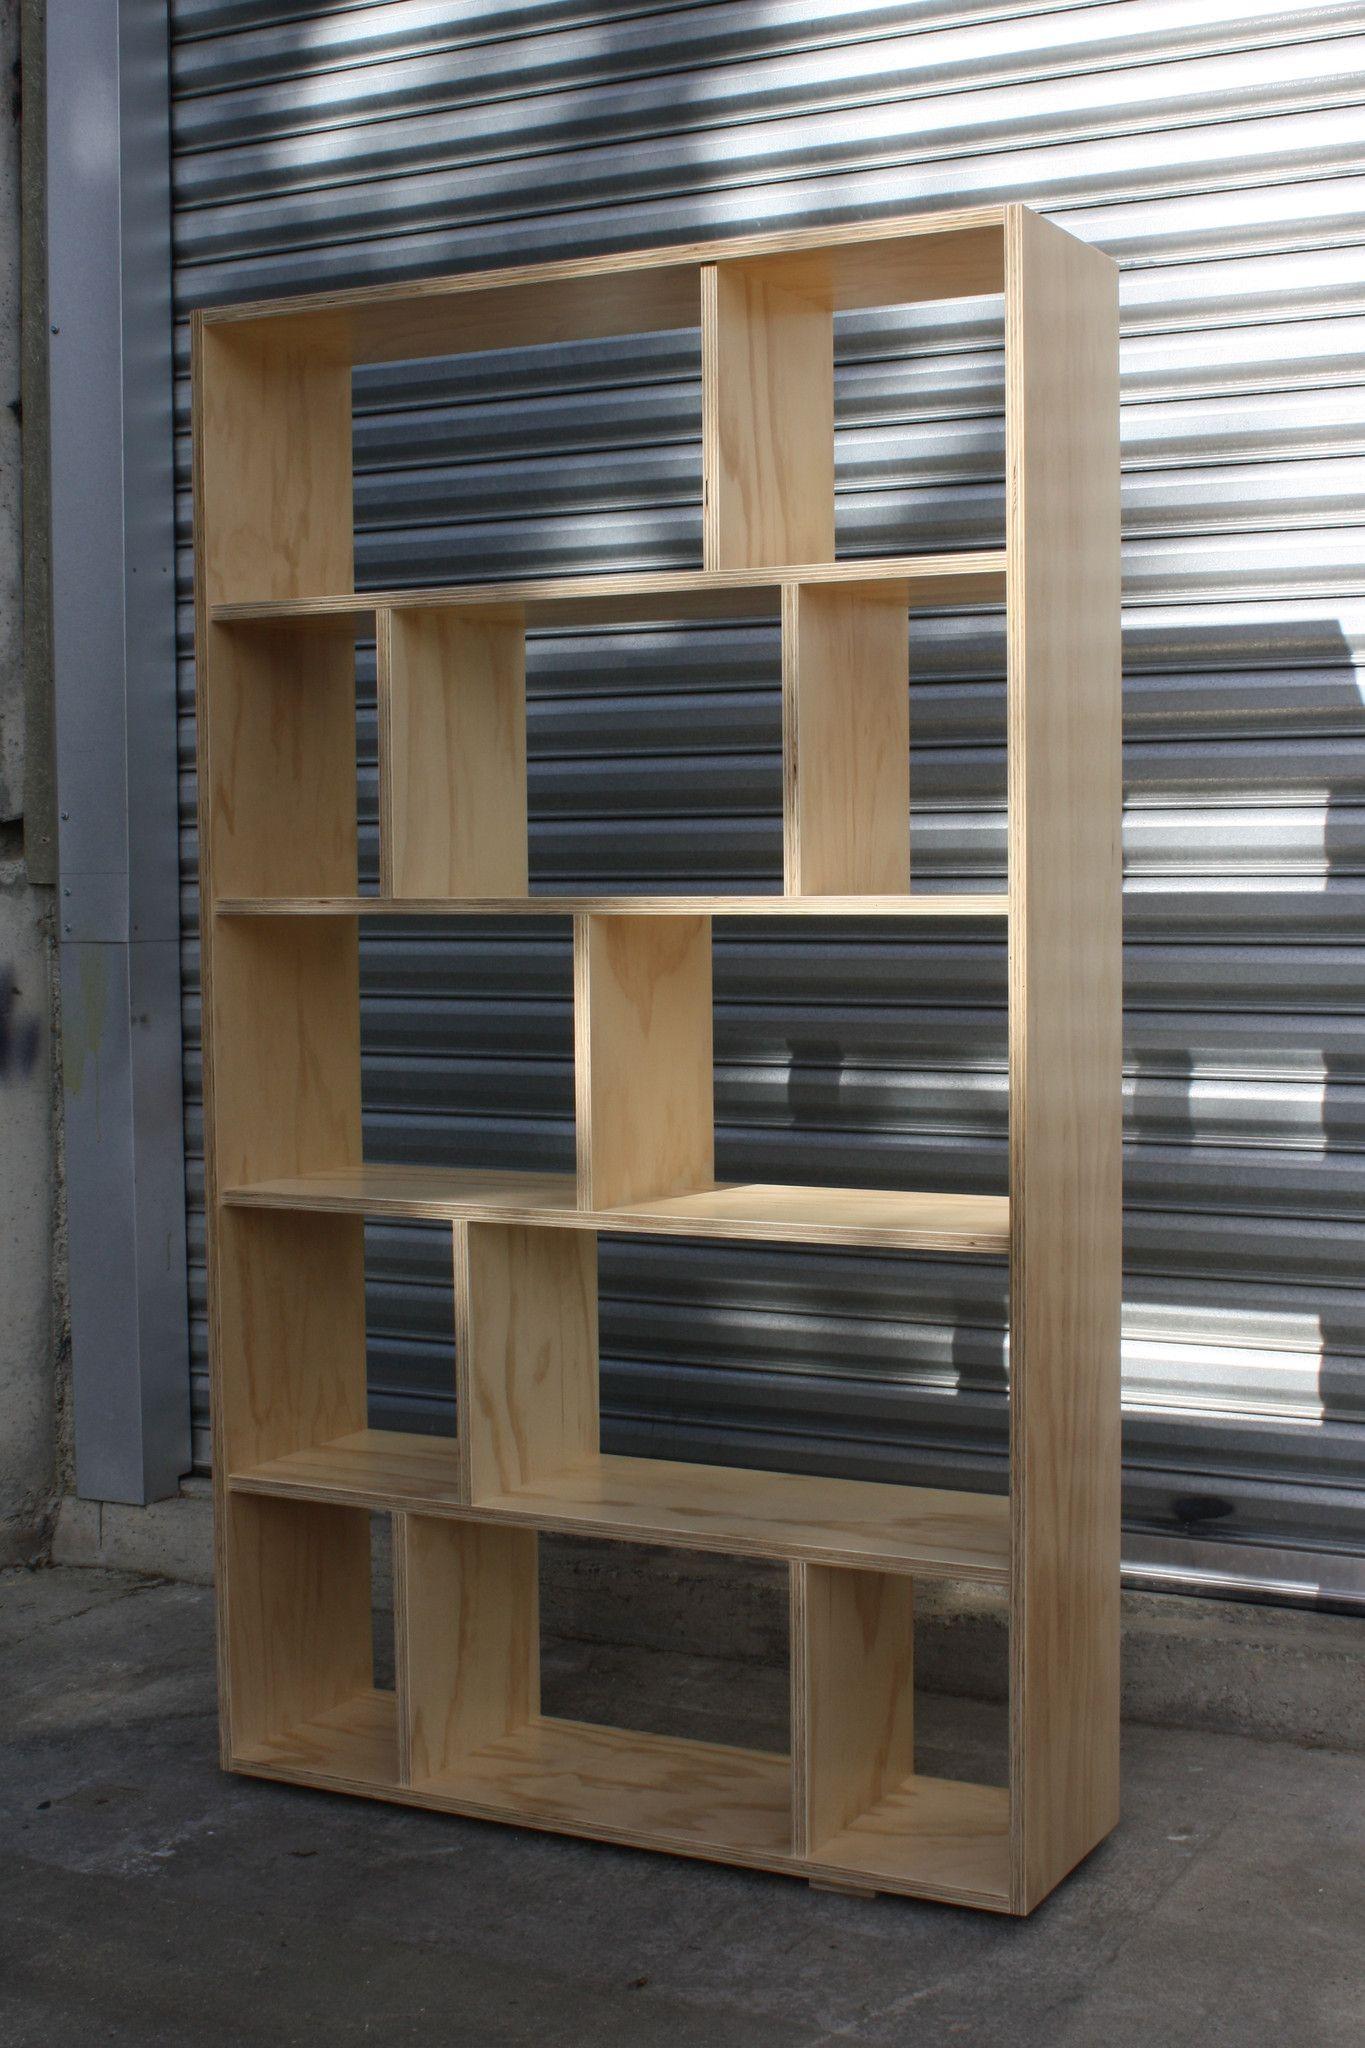 Radiata plywood bookshelf with brick configuration make for Made design